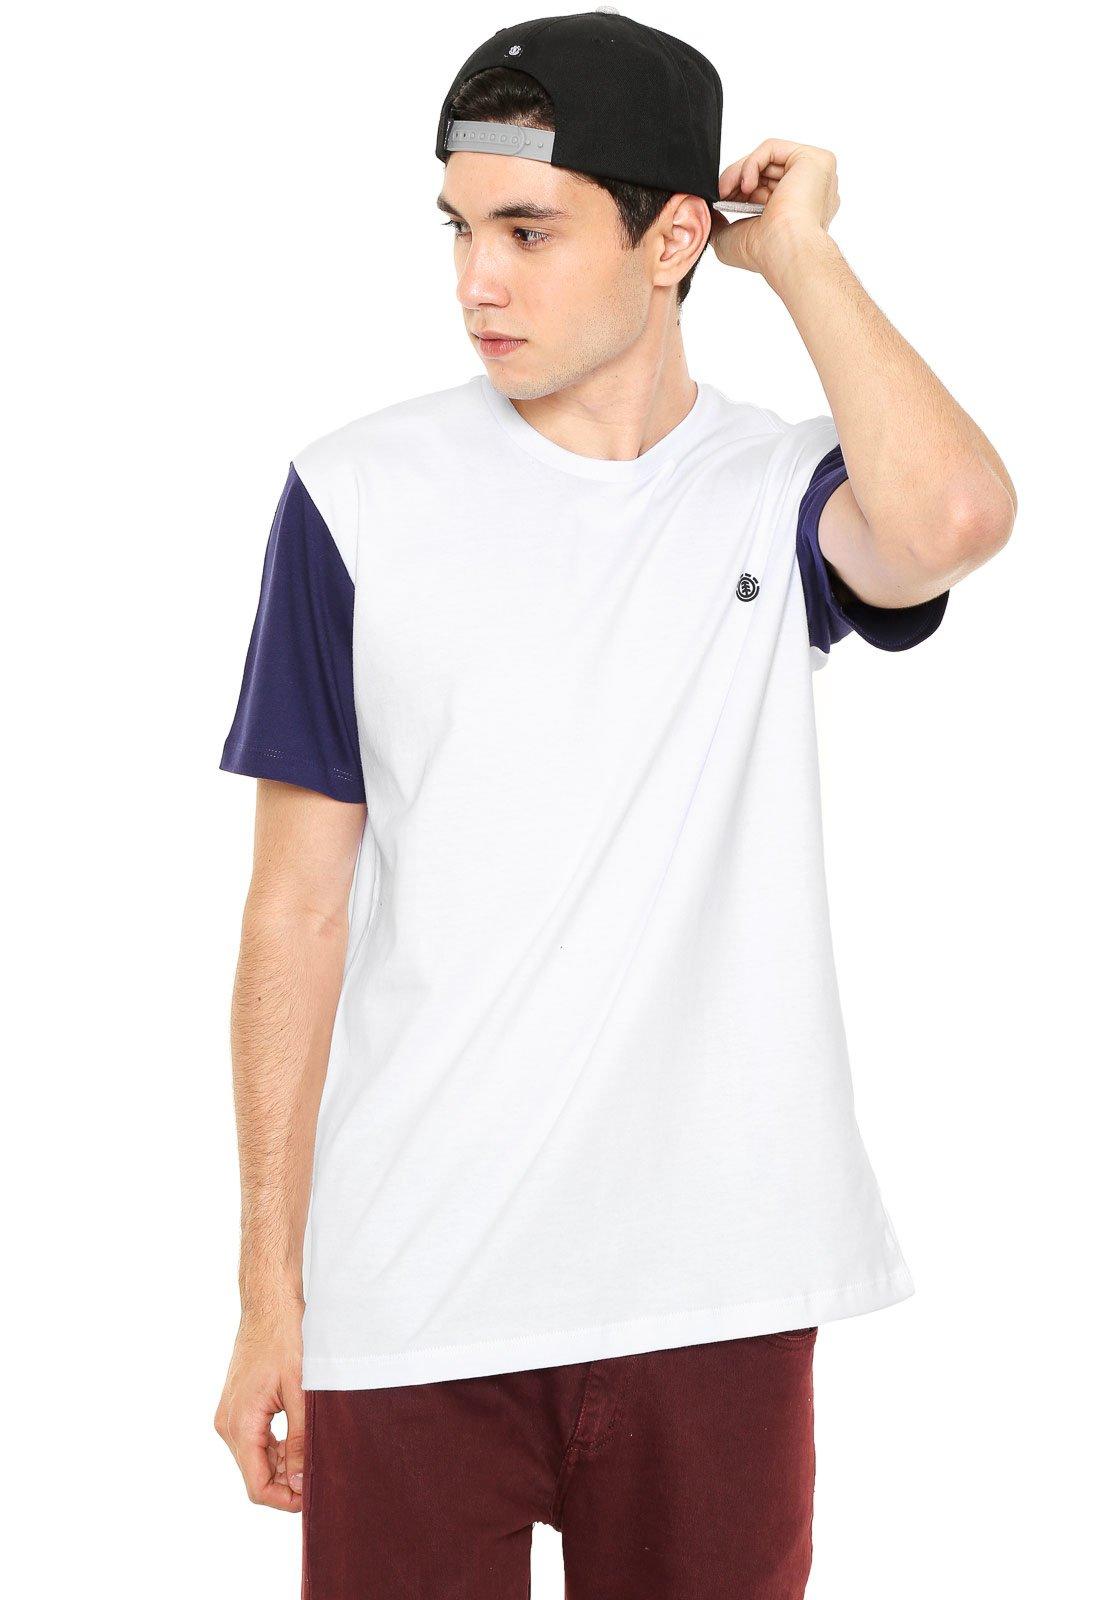 Camisetas baratas na Black Friday 8b7829849bd